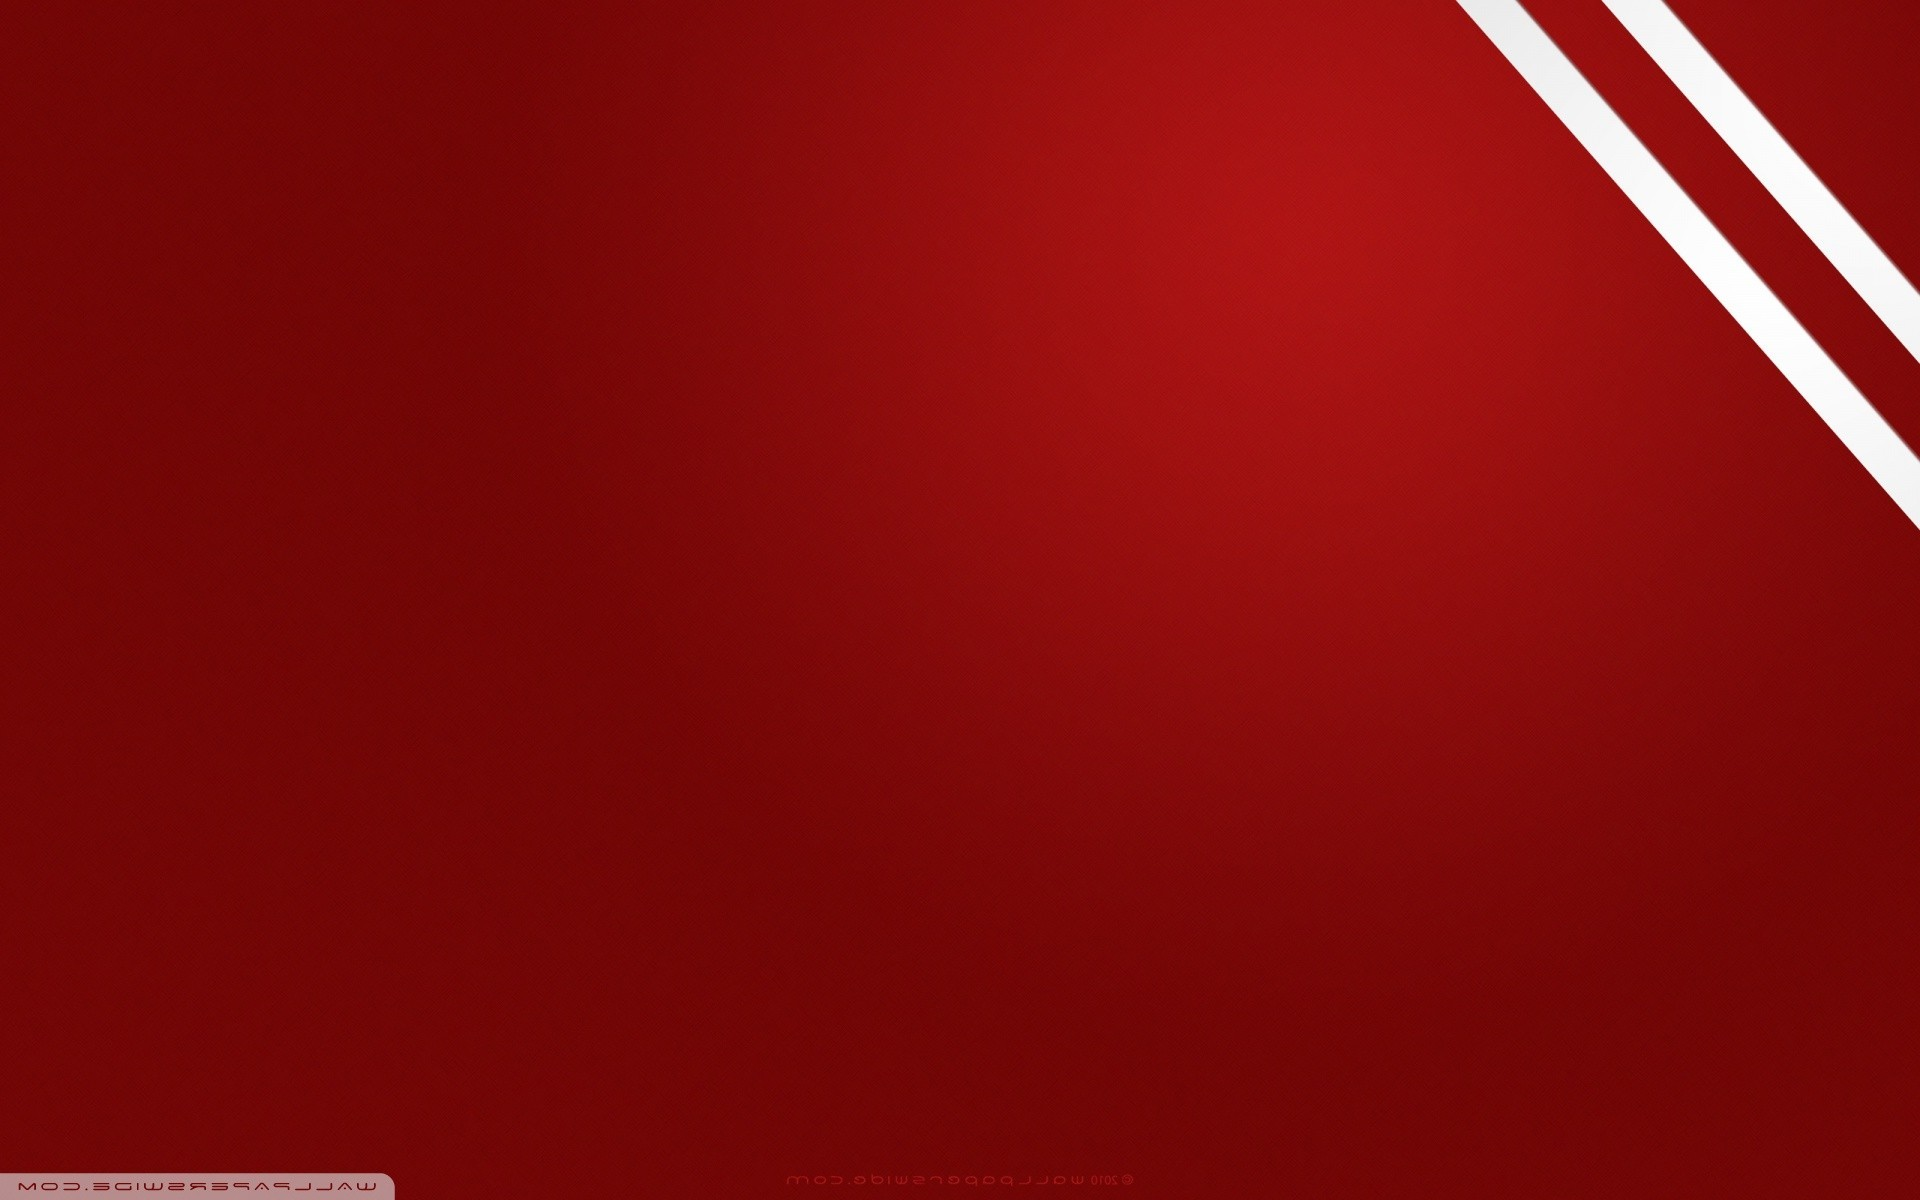 Red And White Wallpaper 4 Cool Wallpaper. Mini Kitchen Design Ideas. B&q Kitchen Design Software. Pastry Kitchen Design. Living Design Kitchens. Colorado Kitchen Design. Kitchen Design Colour Combinations. Kitchen Cabinet Ikea Design. Ikea Kitchen Cabinets Design